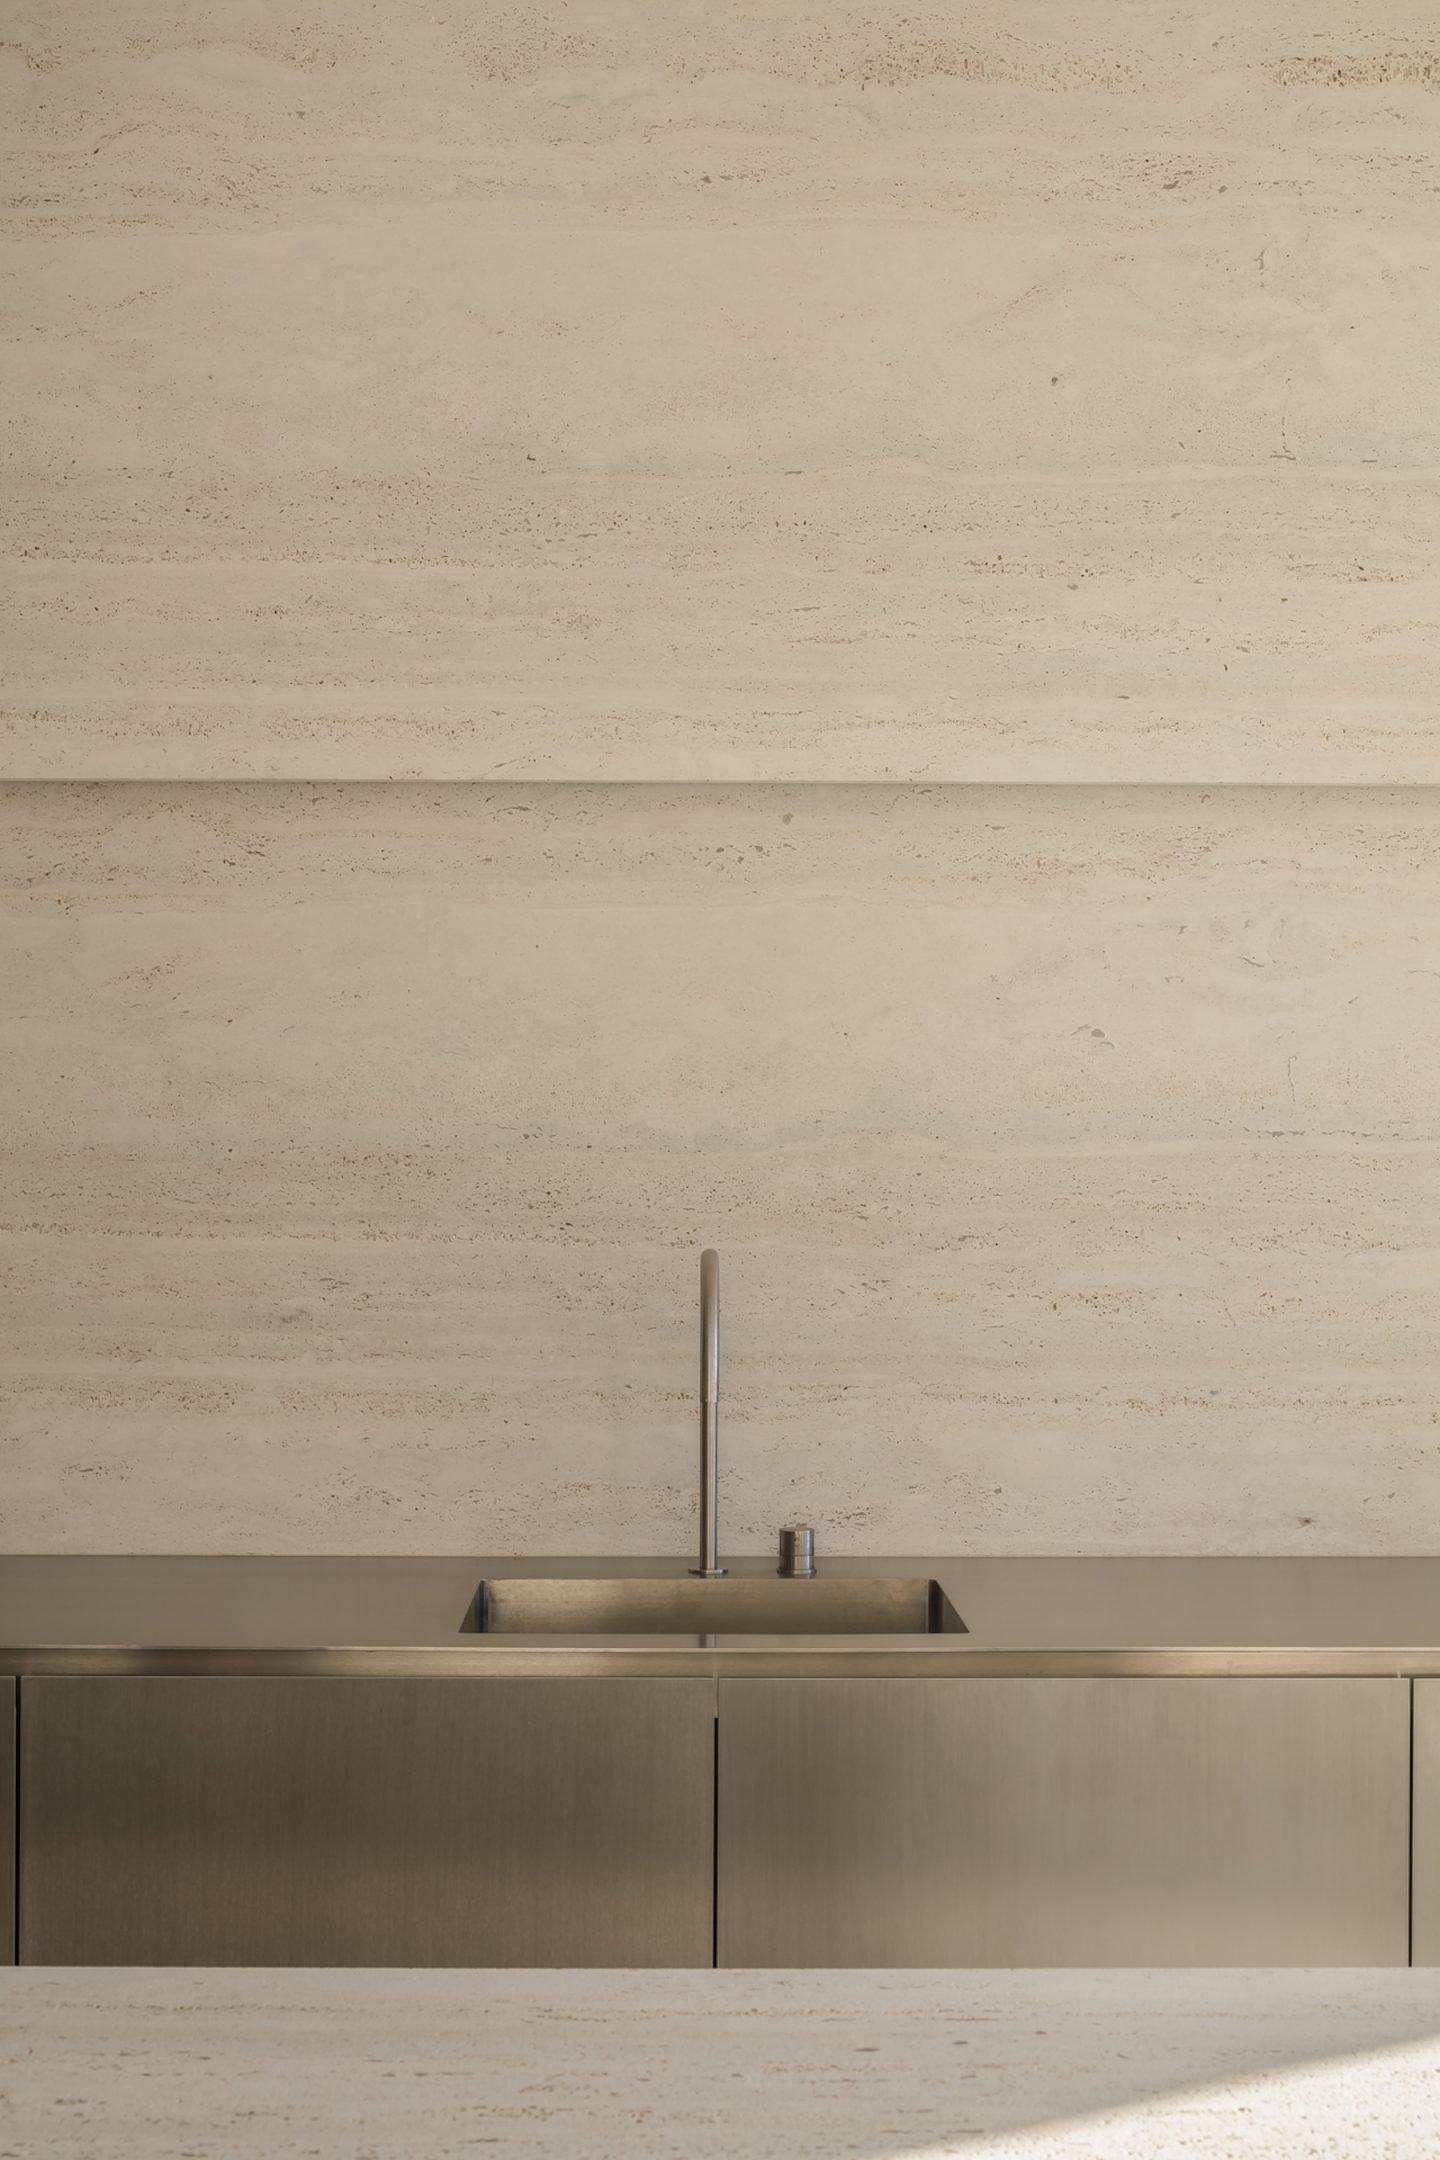 IGNANT-Design-Marie-Stadsbader-Diapal-05